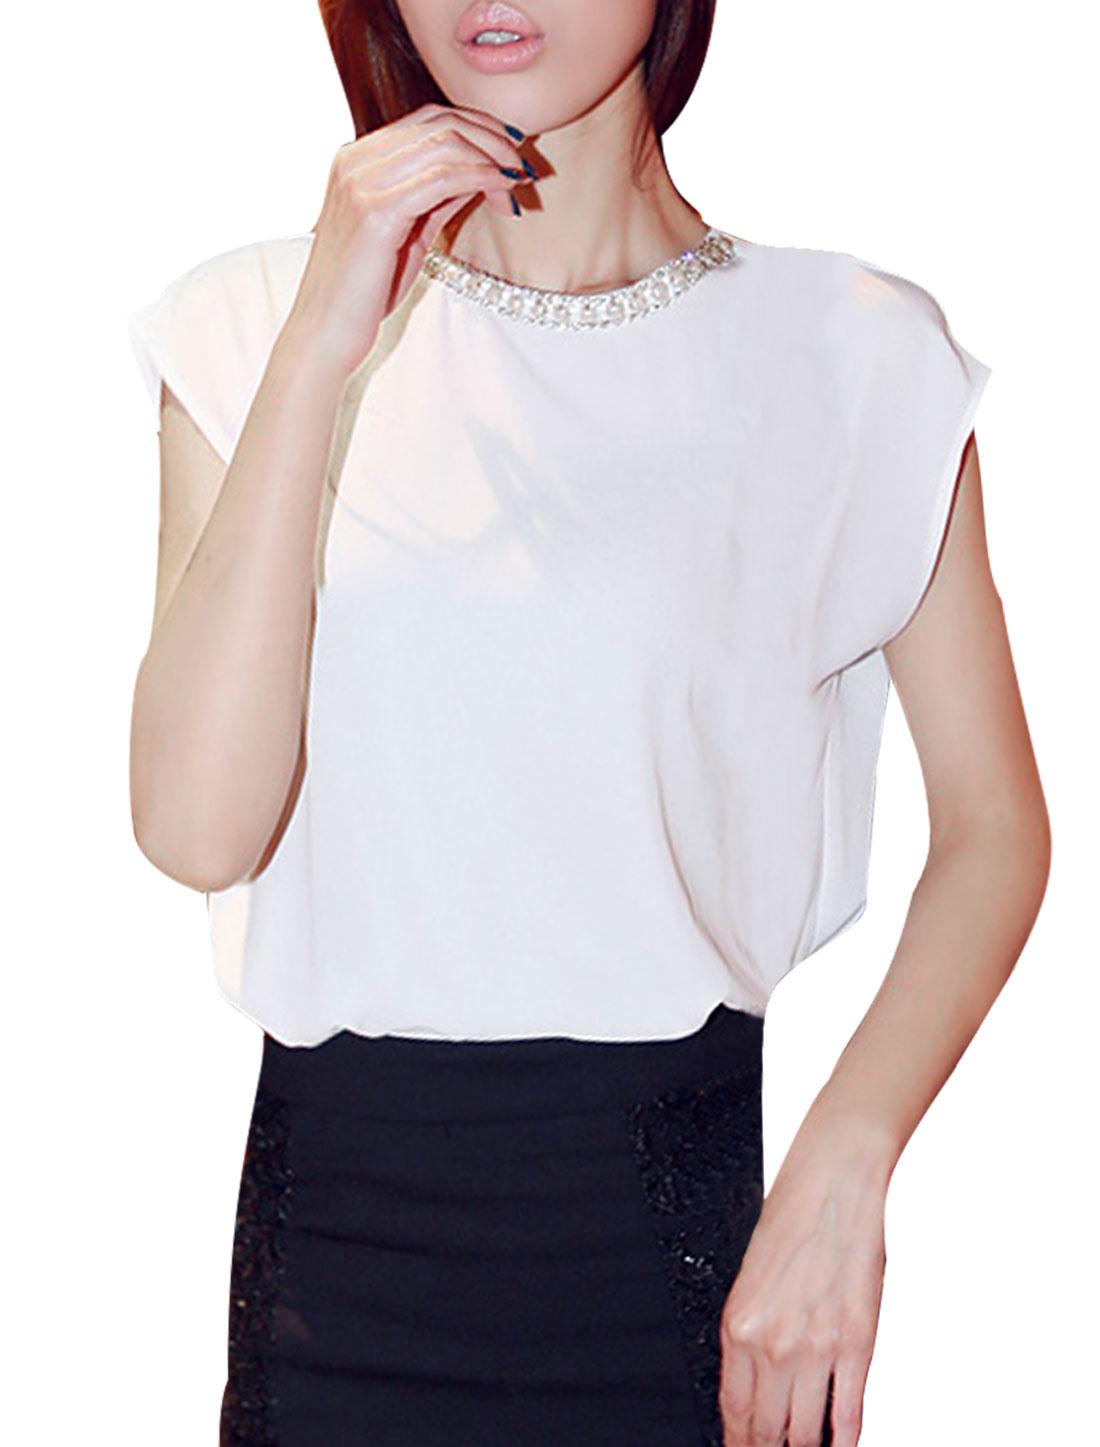 Woman New Fashion Fake Diamond Chain Decor Solid Color White Blouse S